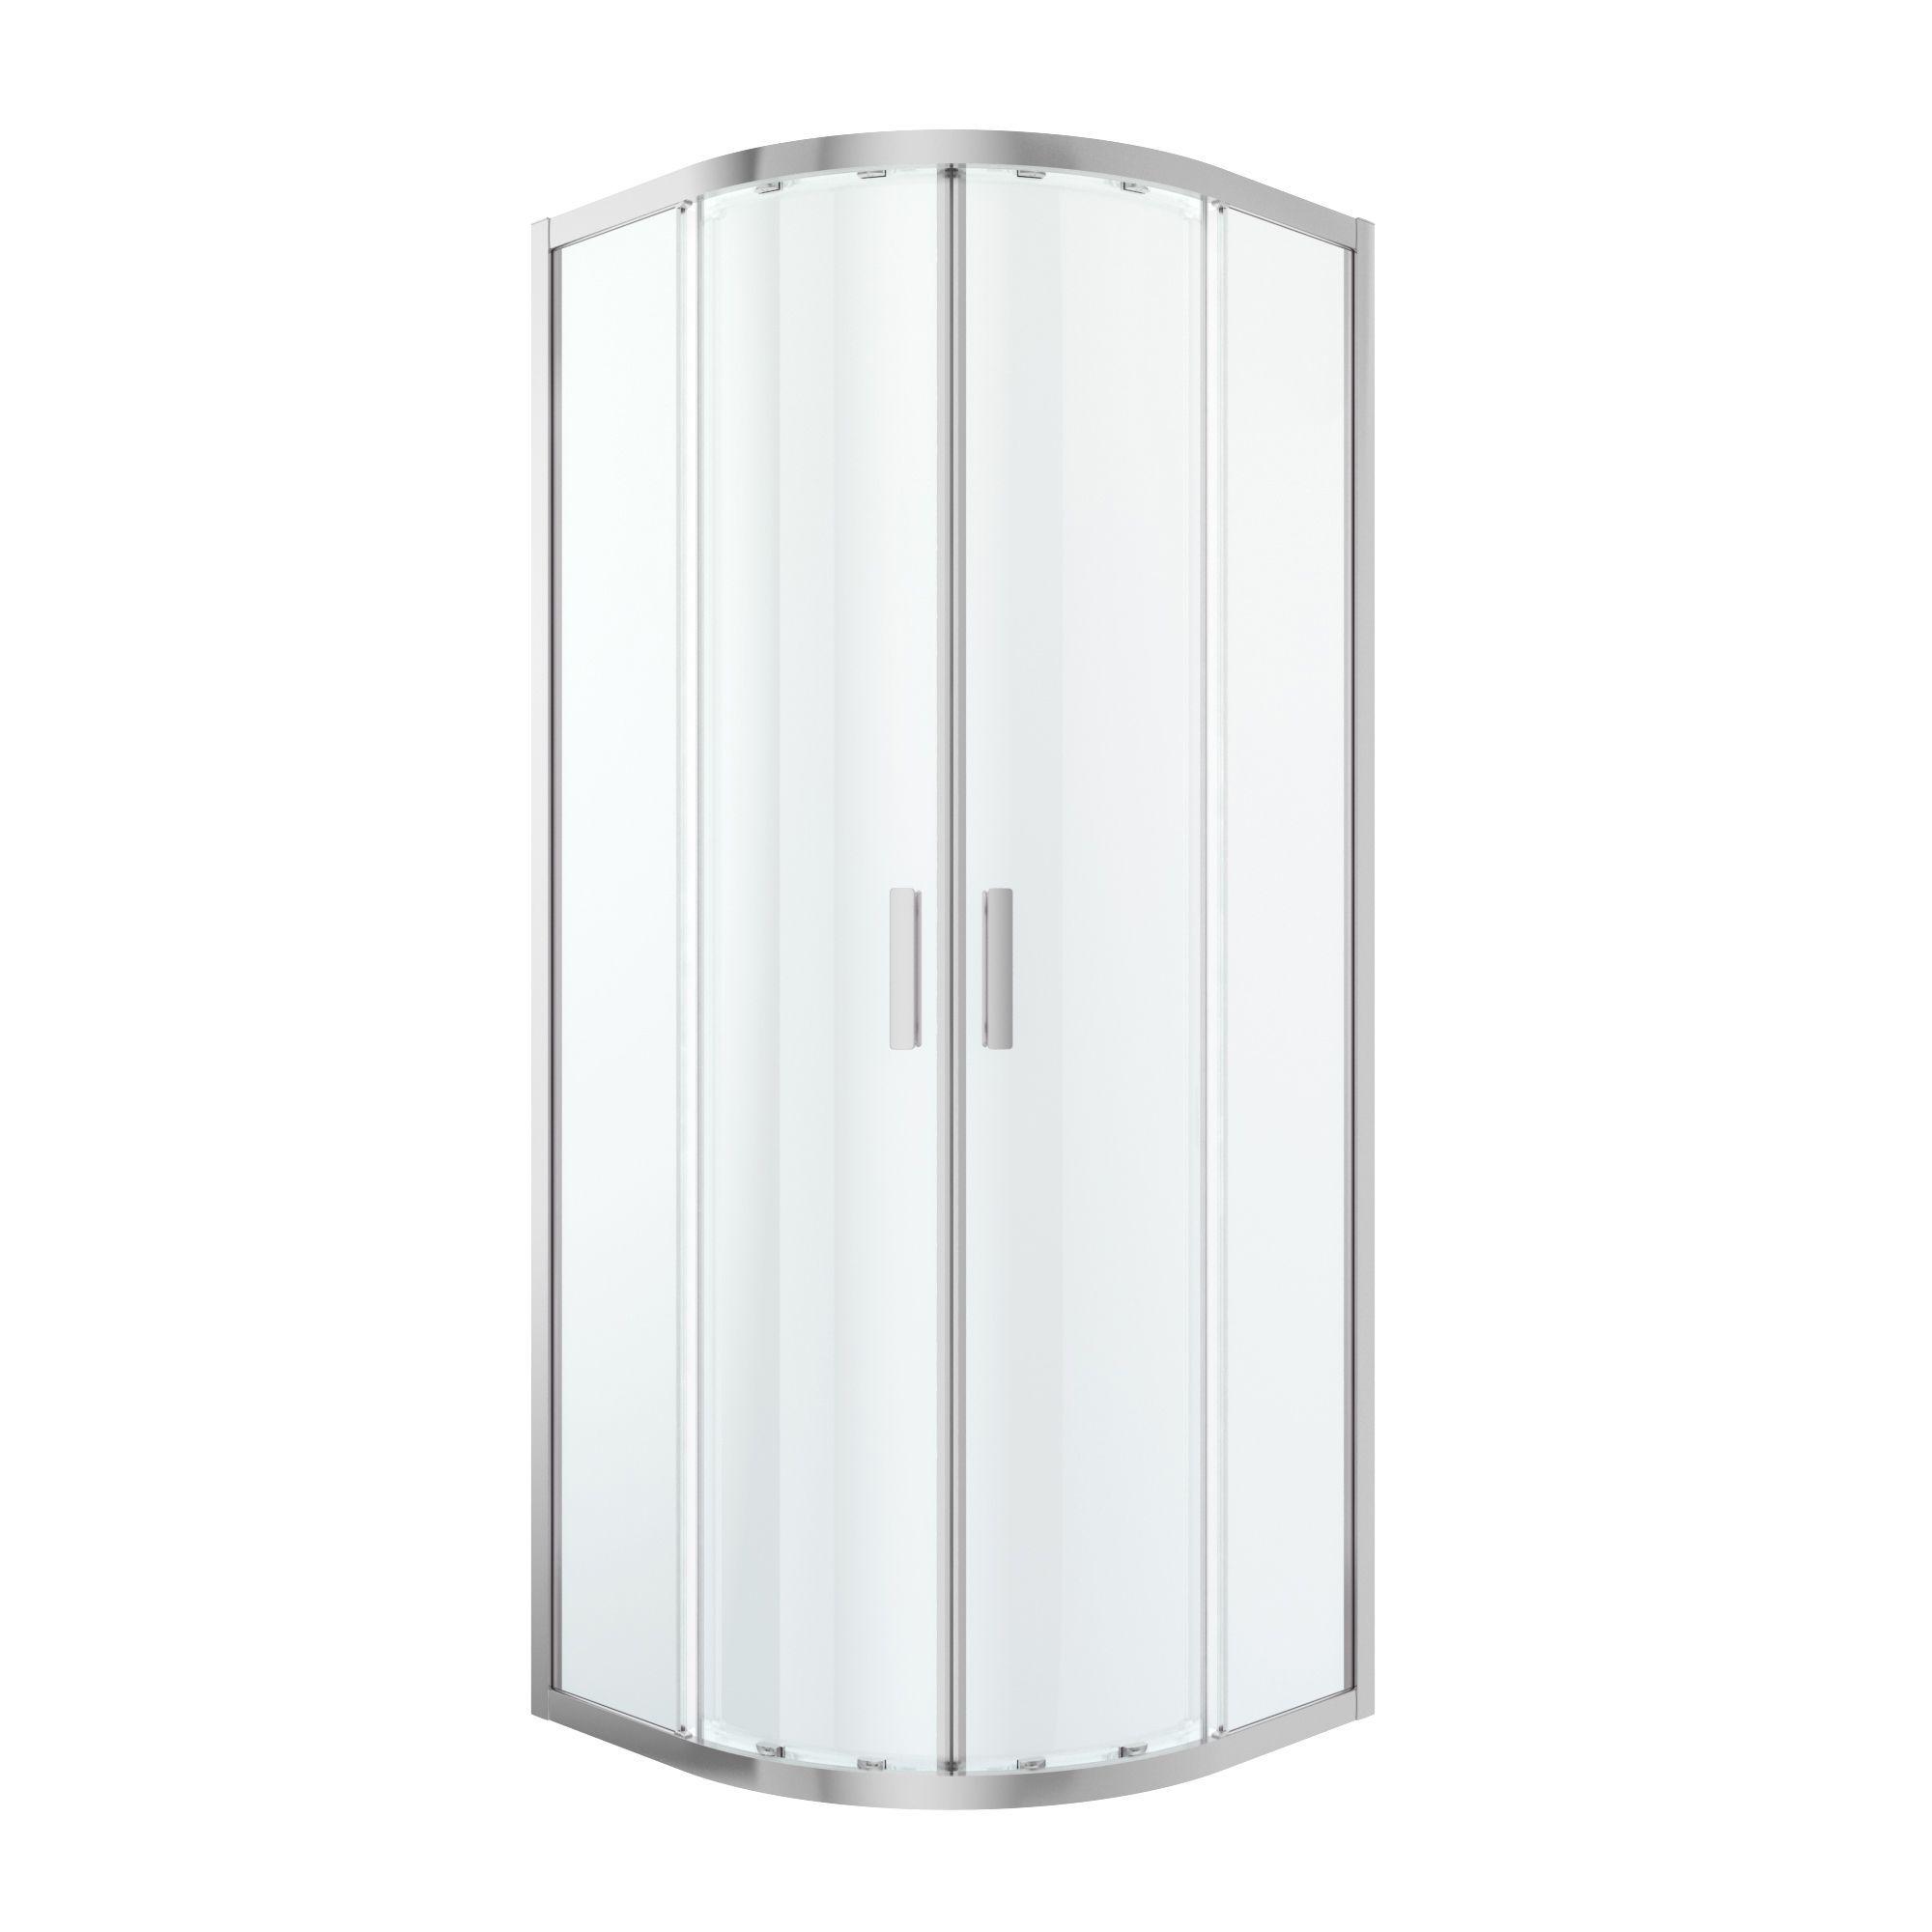 Cooke & Lewis Beloya Quadrant Shower Enclosure With Corner Entry Double Sliding Door (w)800mm (d)800mm